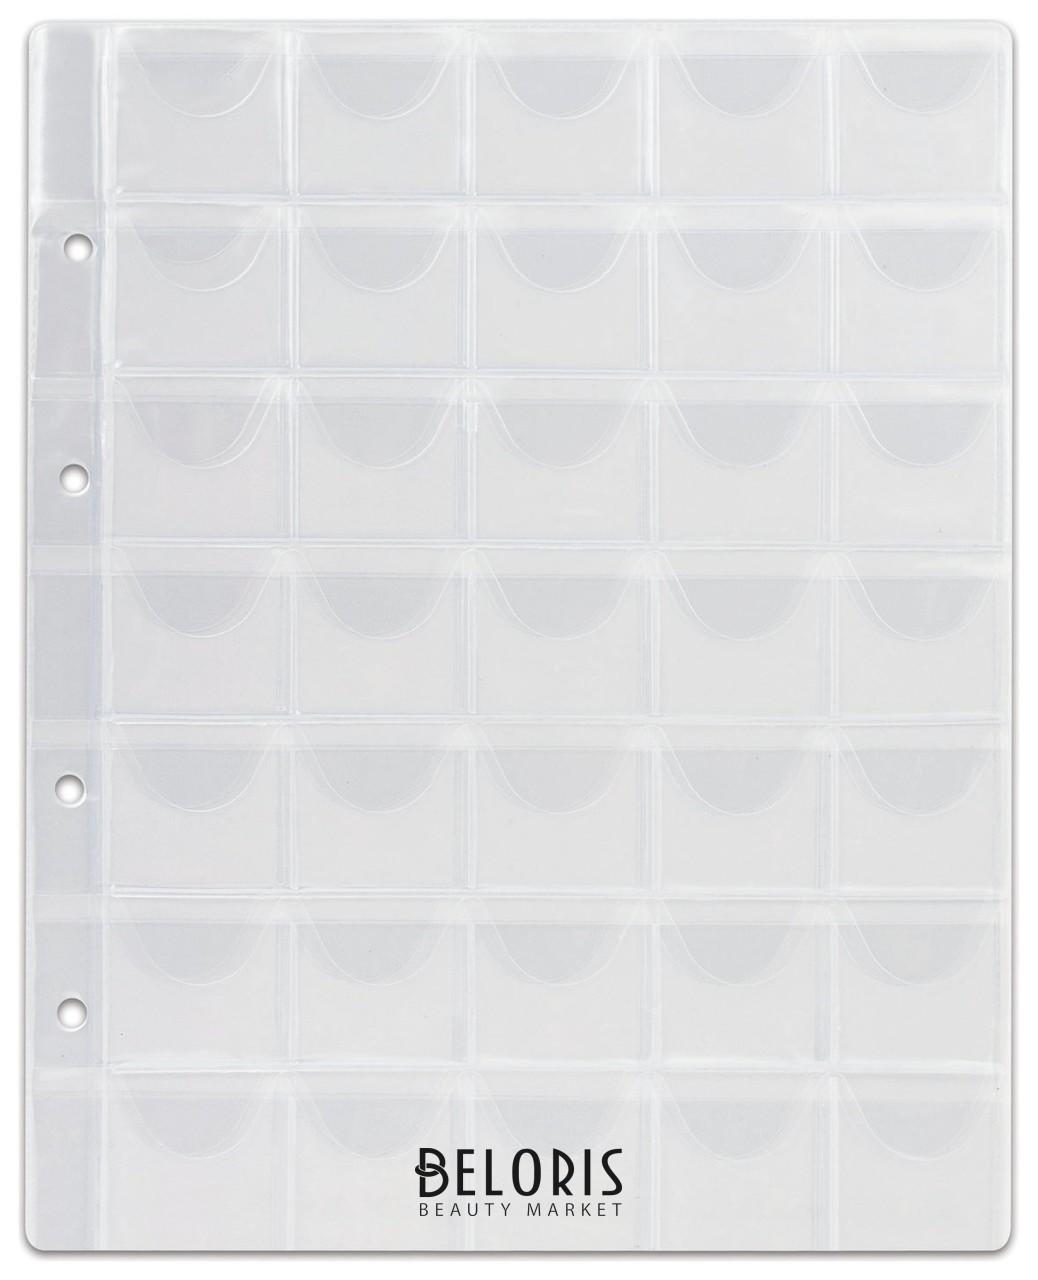 Листы-вкладыши для монет для альбома Оптима М9-05, комплект 5 шт., 200х250 мм, 35 карманов Топ-спин